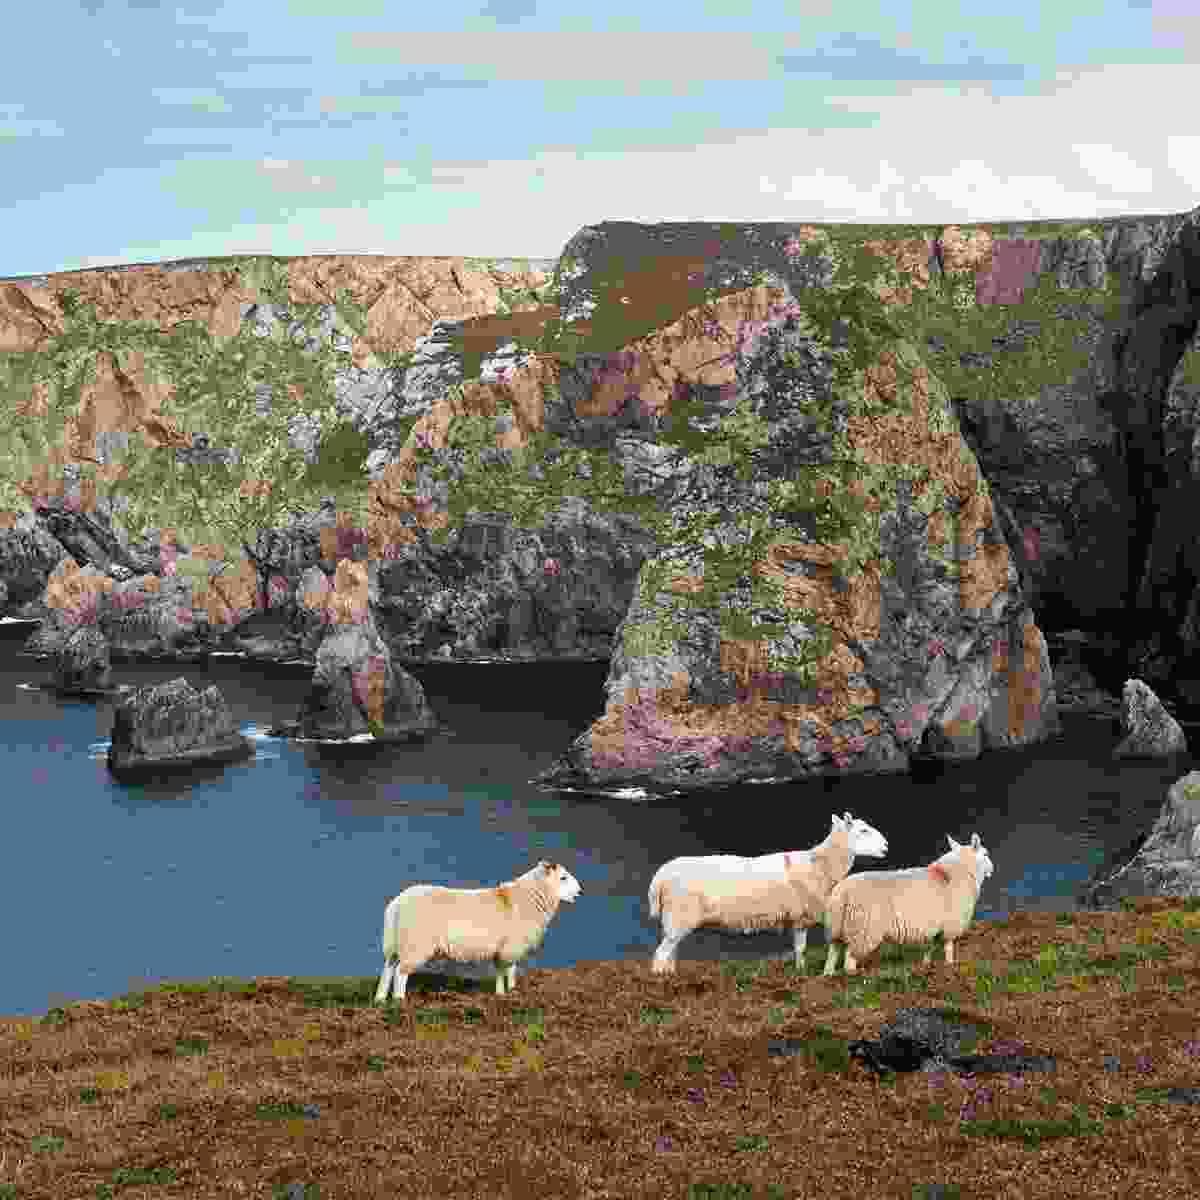 Sheep on Arranmore Island (Tourism Ireland)